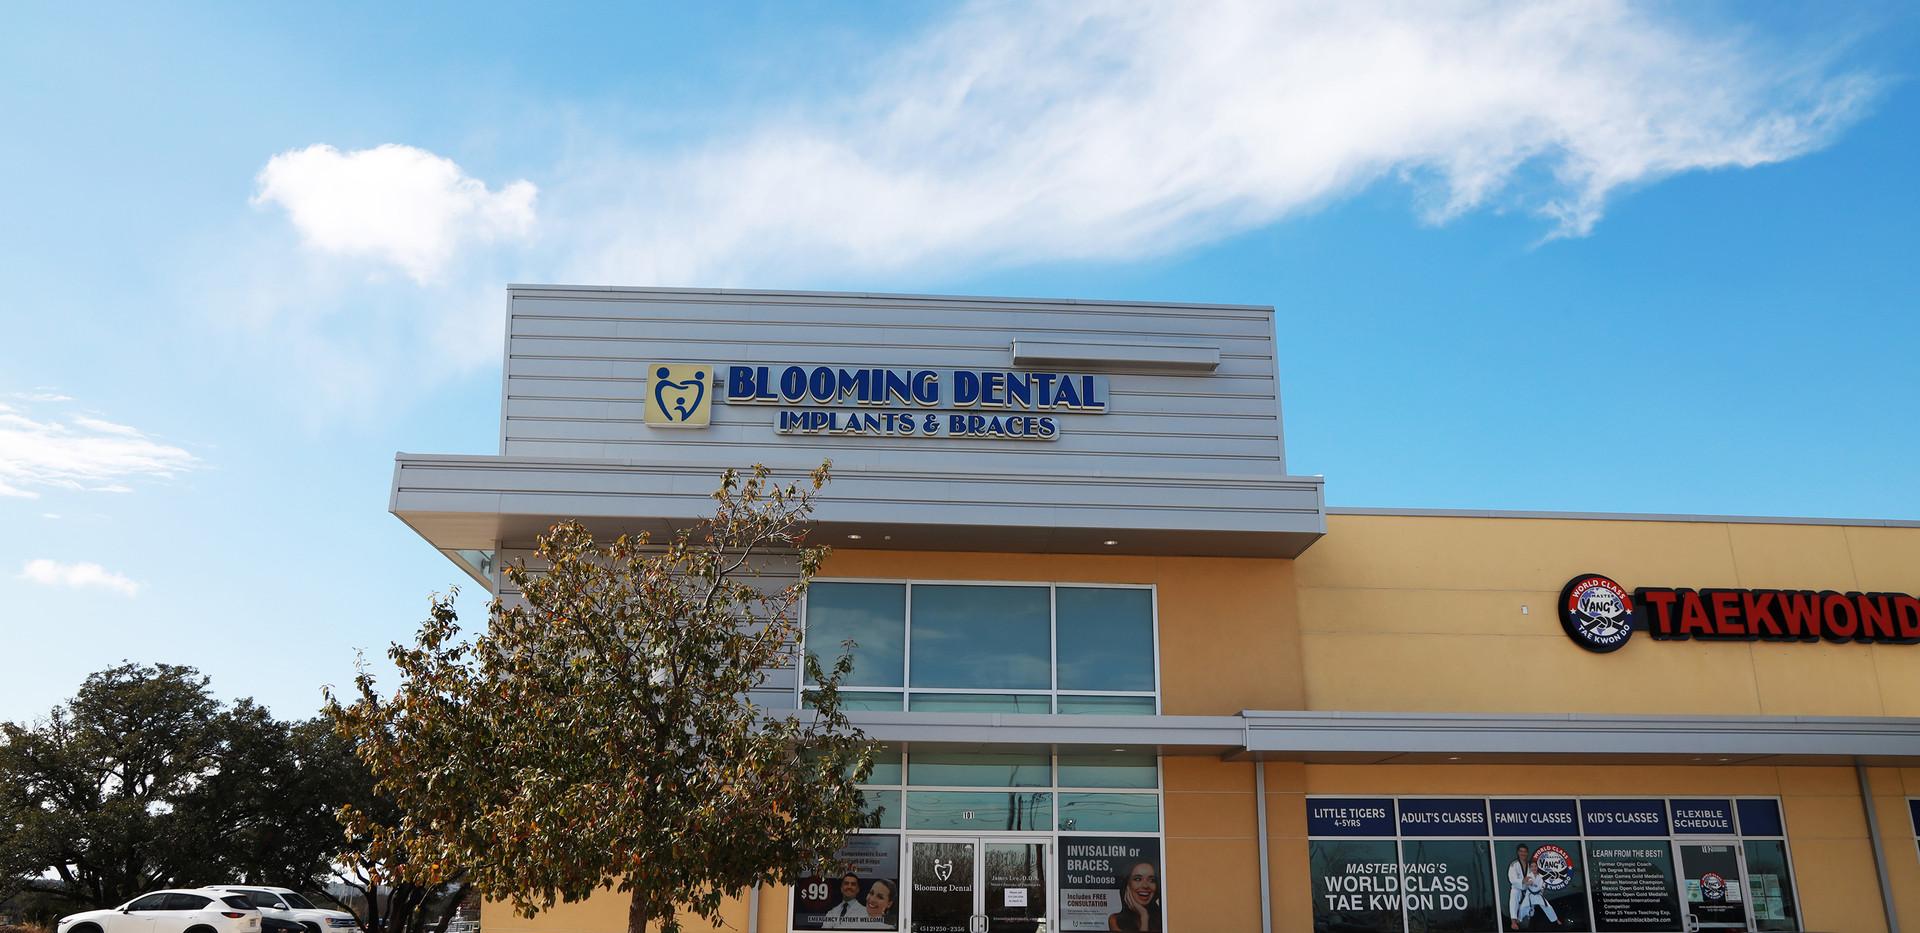 Blooming Dental - Family Emergency Impla